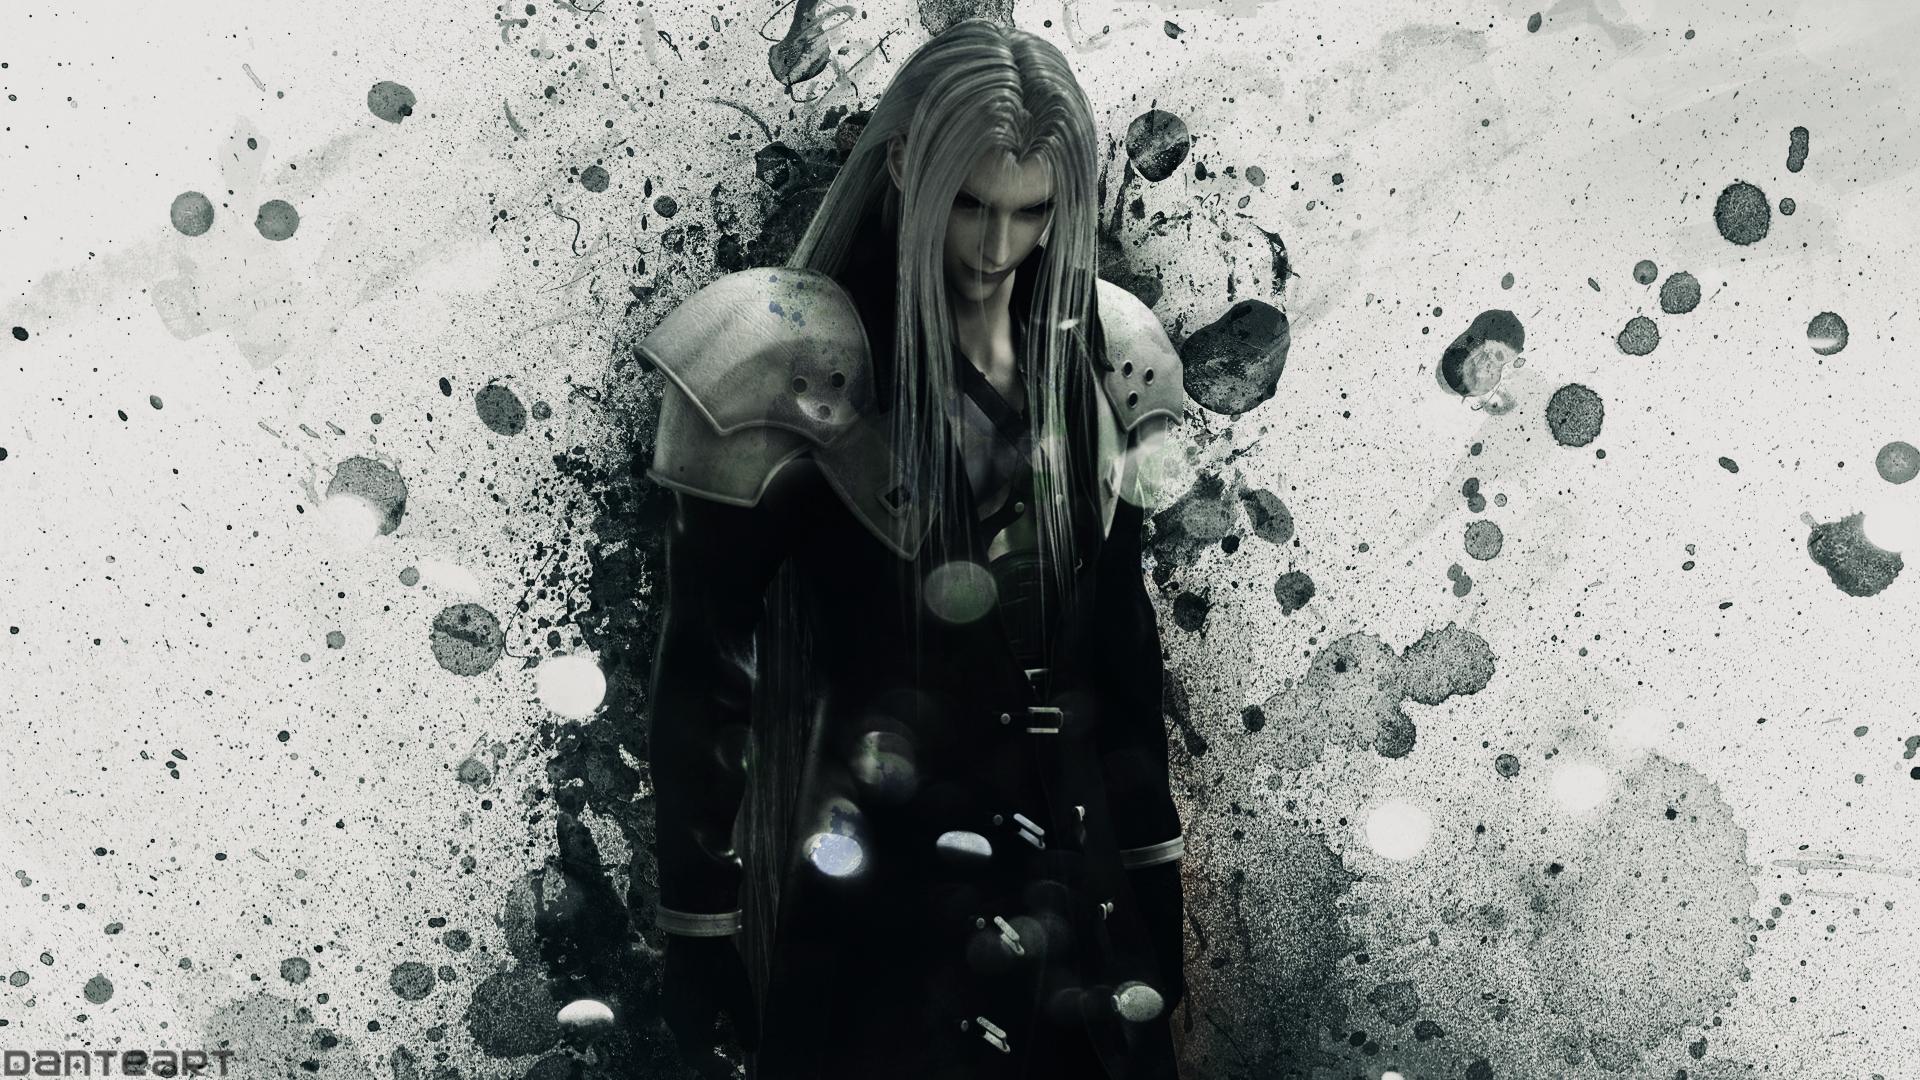 Crisis Core Final Fantasy Vii Sephiroth Wallpaper By